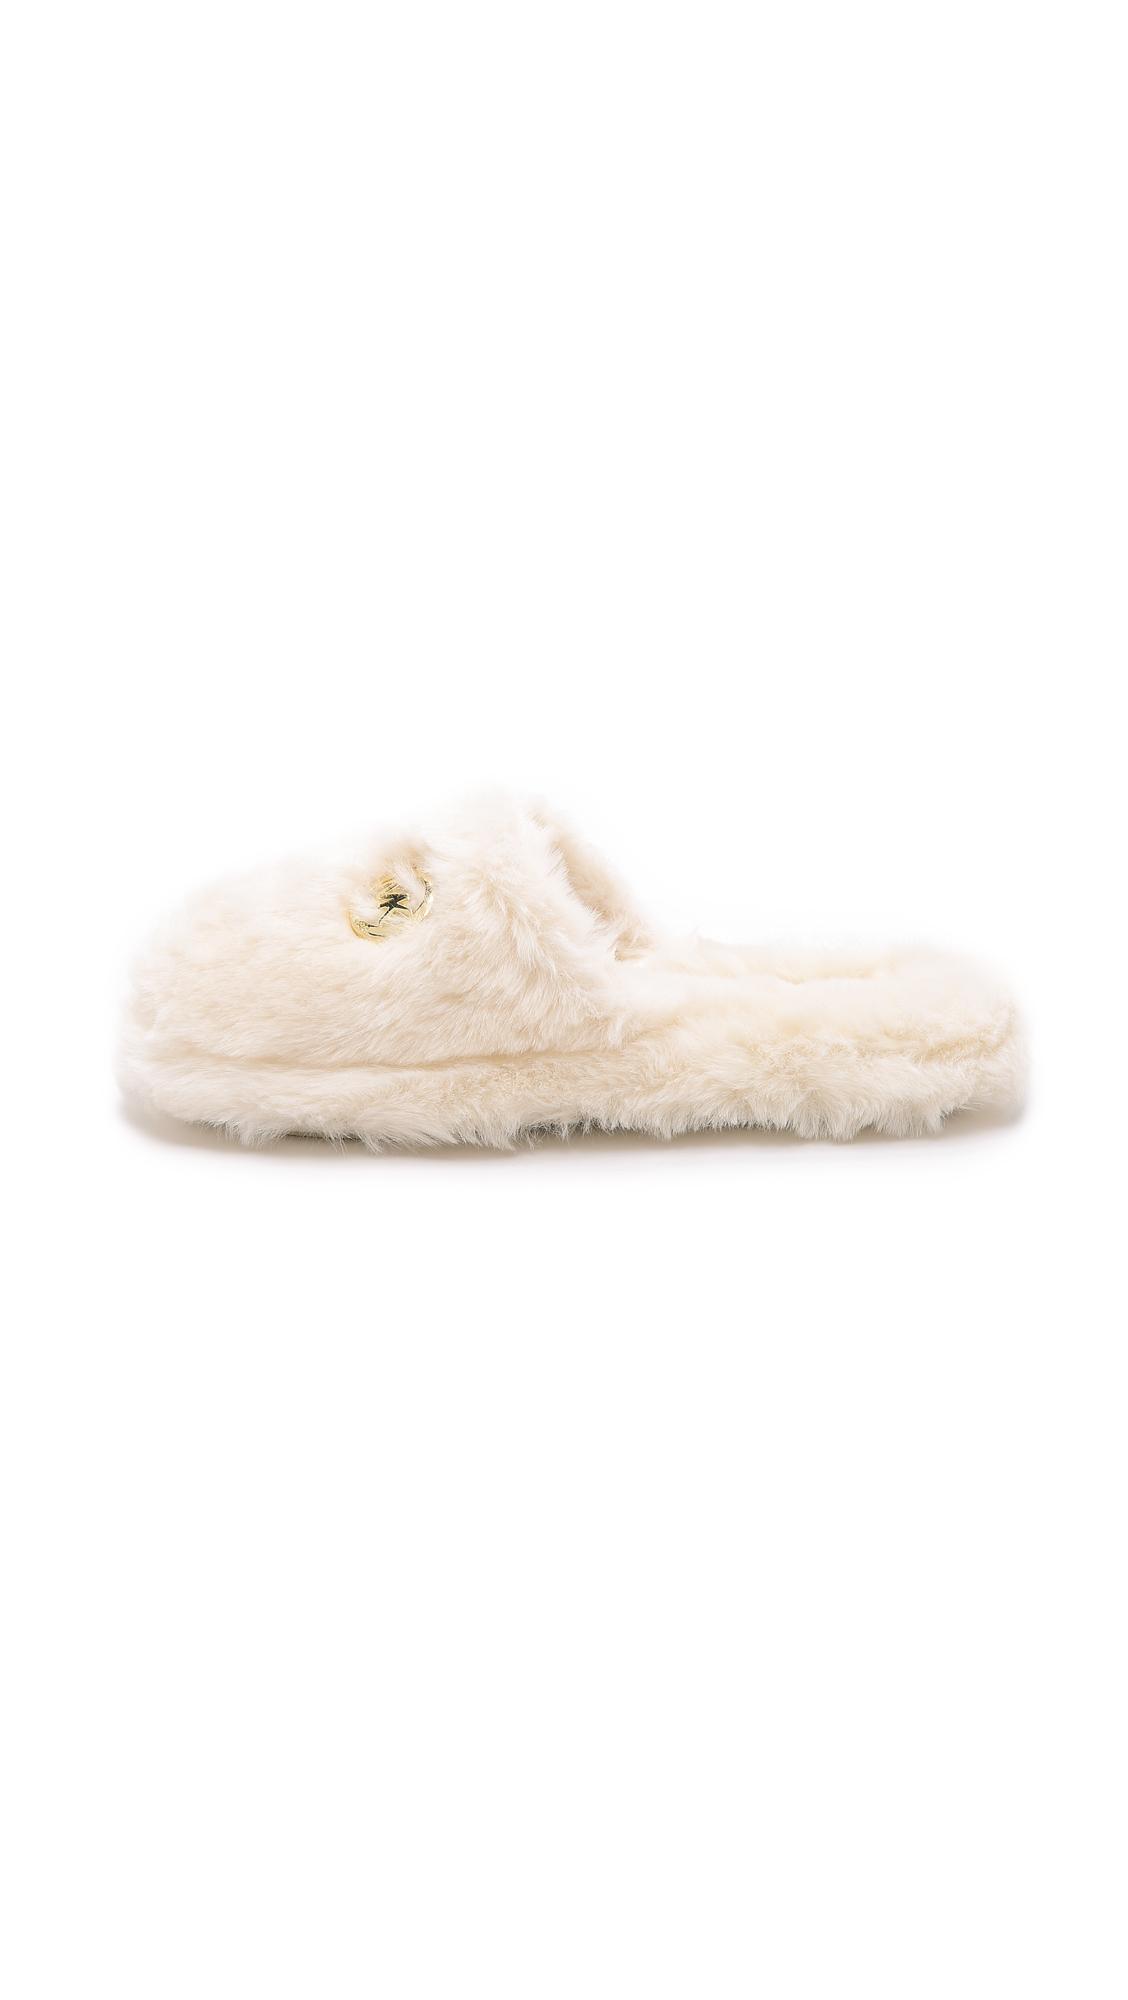 f1dcac3c288e MICHAEL Michael Kors Jet Set Faux Fur Slippers